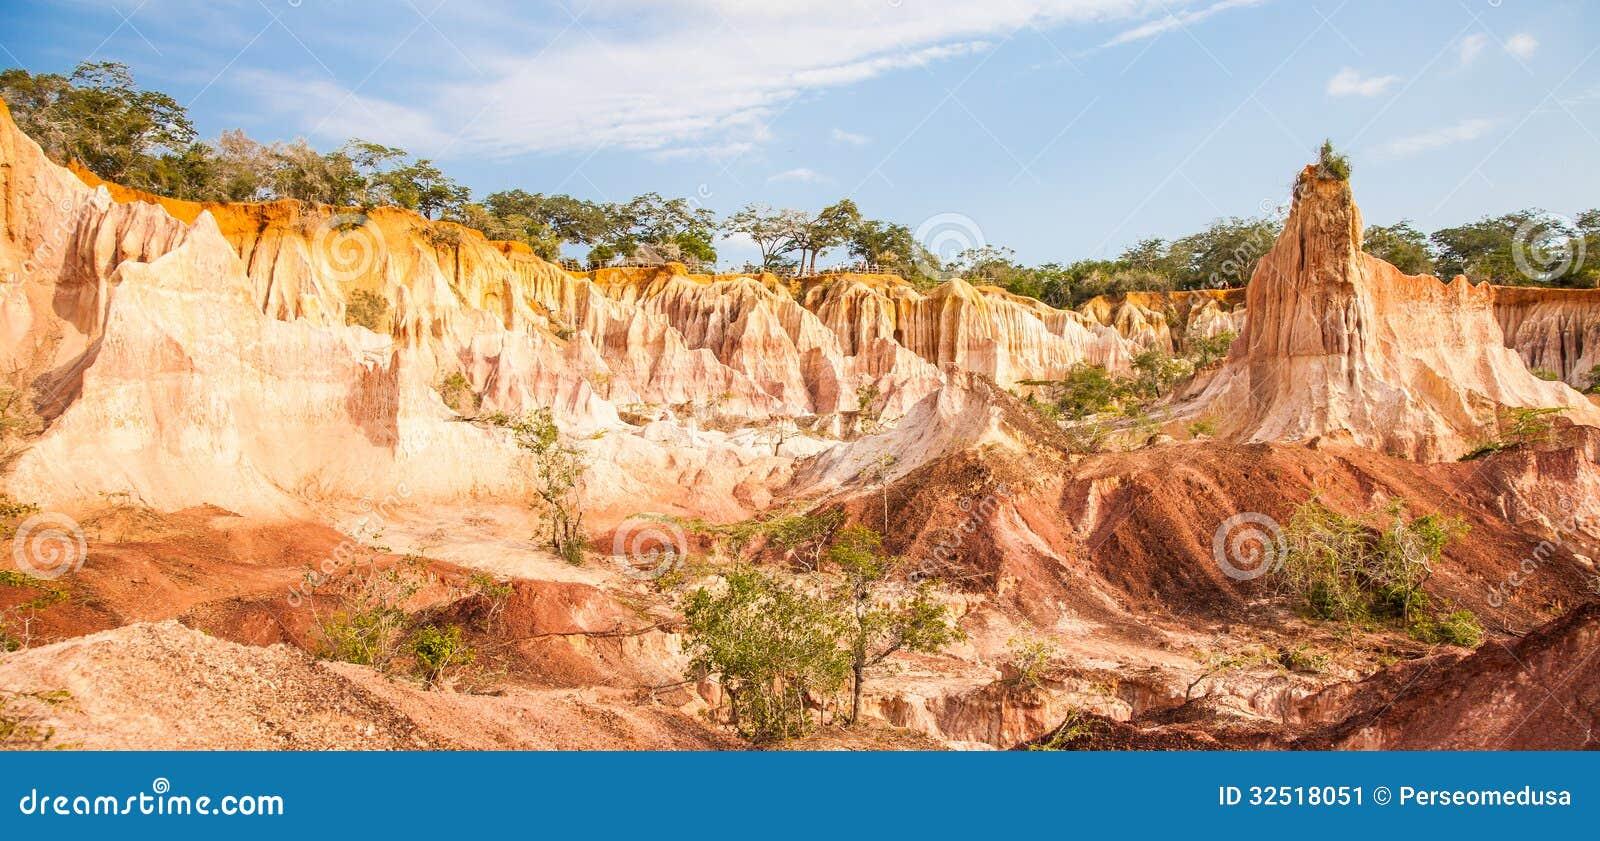 Marafa canyon kenya stock image image 32518051 for Kitchen in the canyon